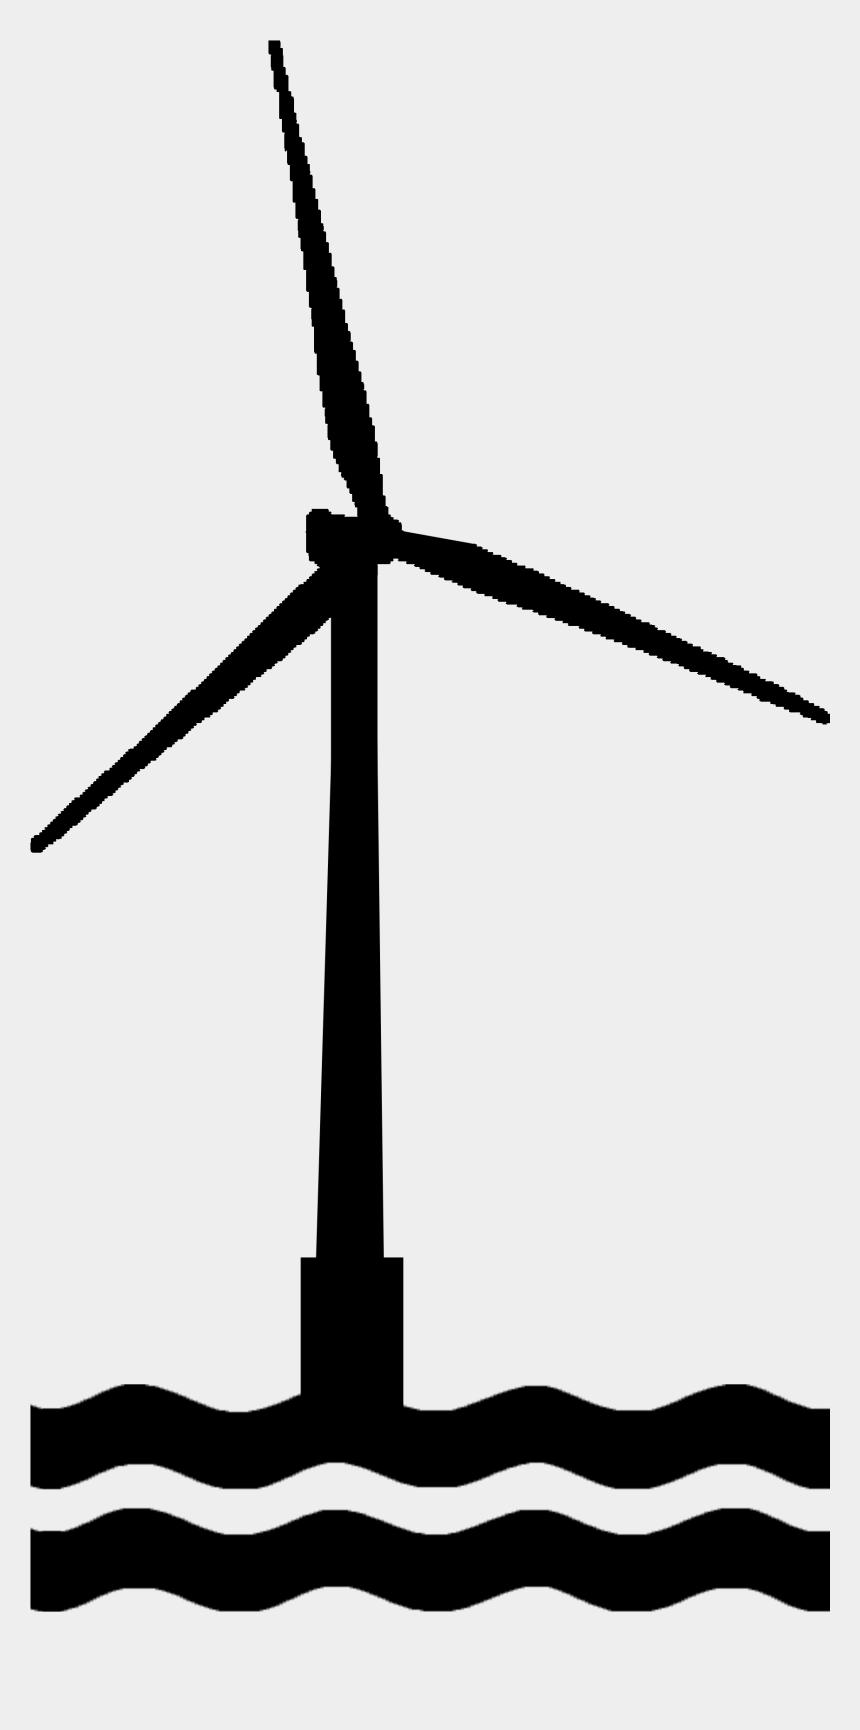 wind turbines clipart, Cartoons - Marine Offshore Wind Turbine Icon - Offshore Wind Turbine Icon